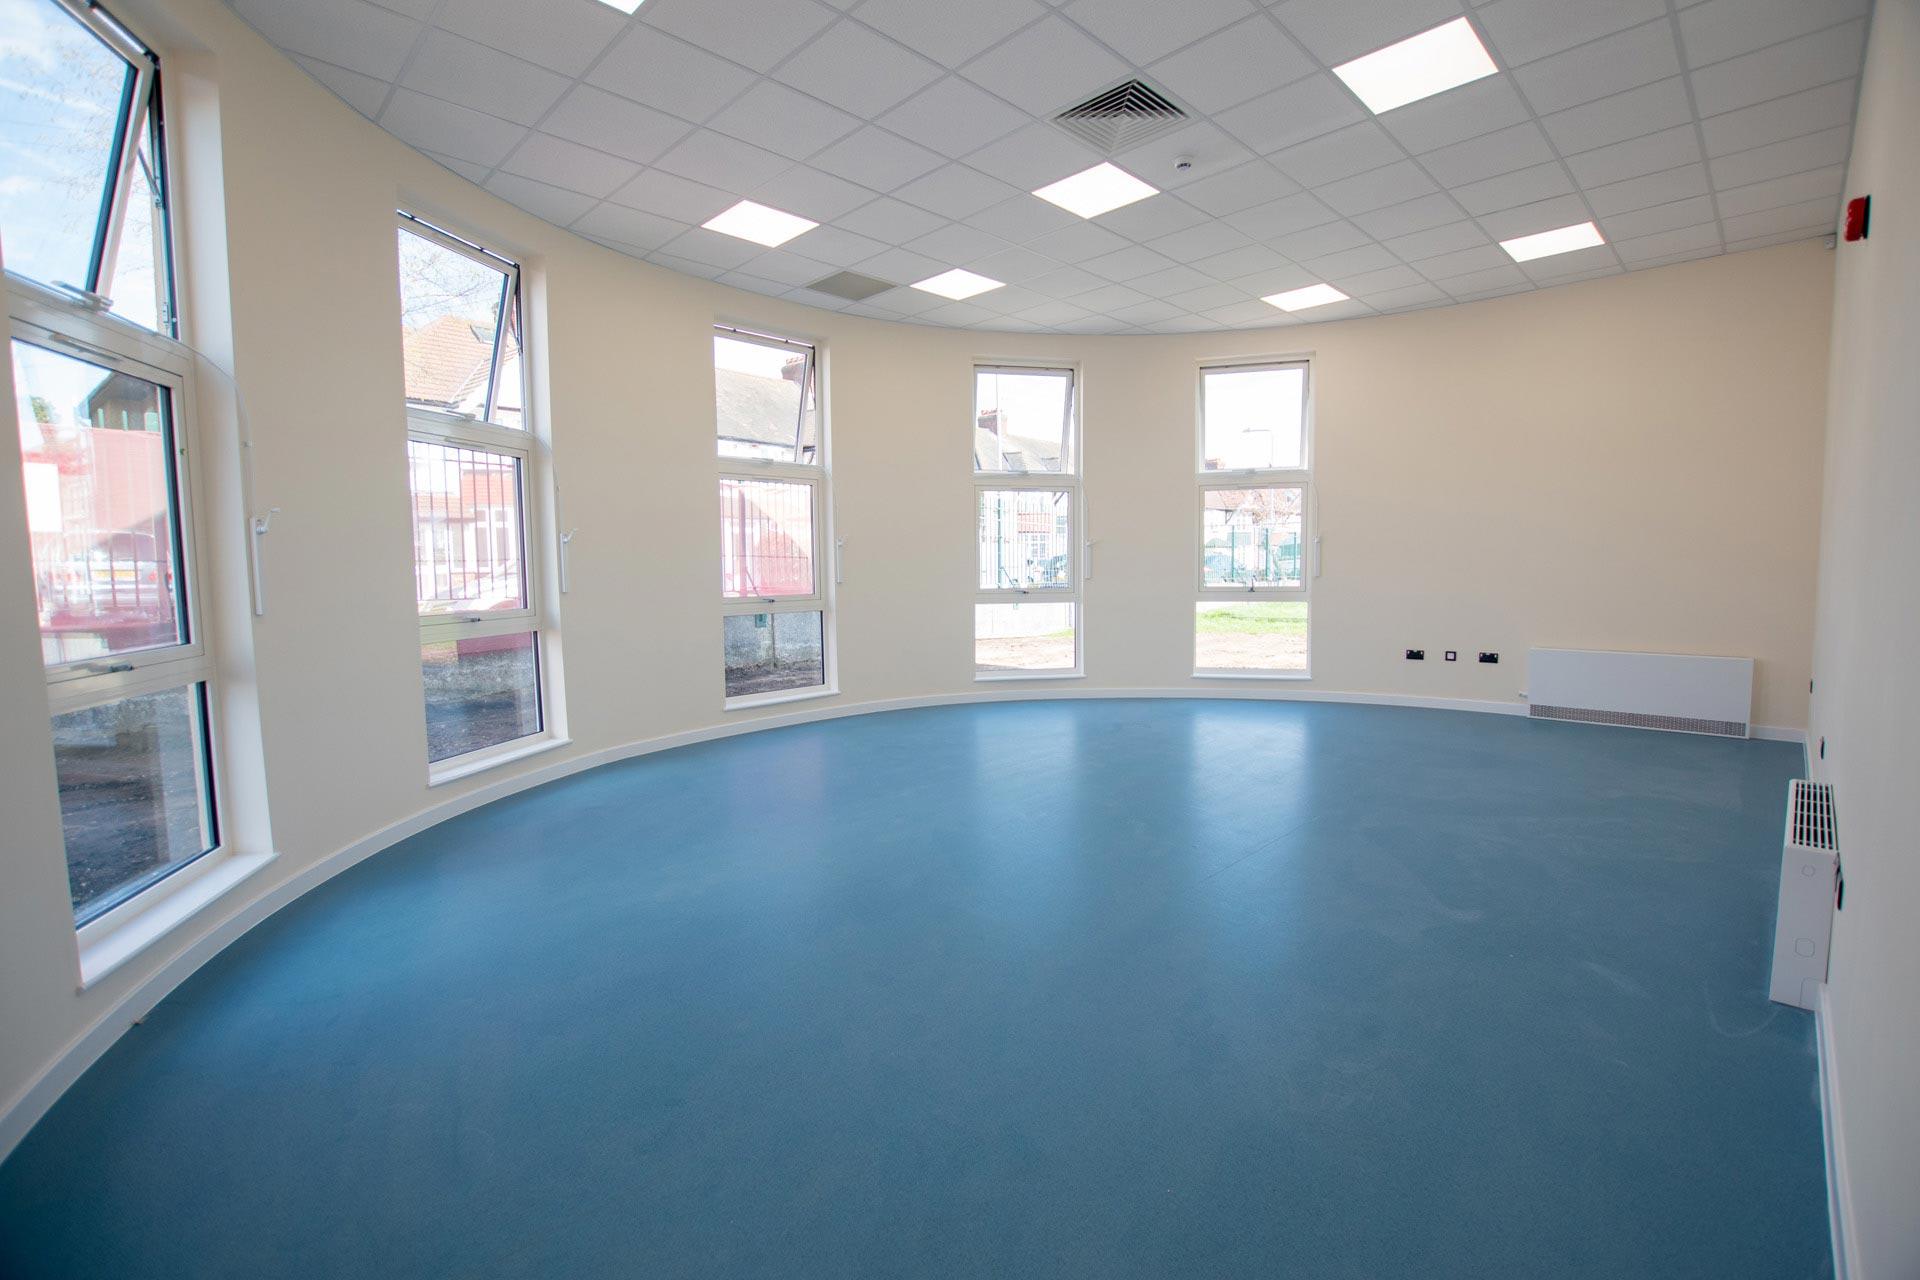 Parkhill Infants and Junior School external - Curved modular building internal